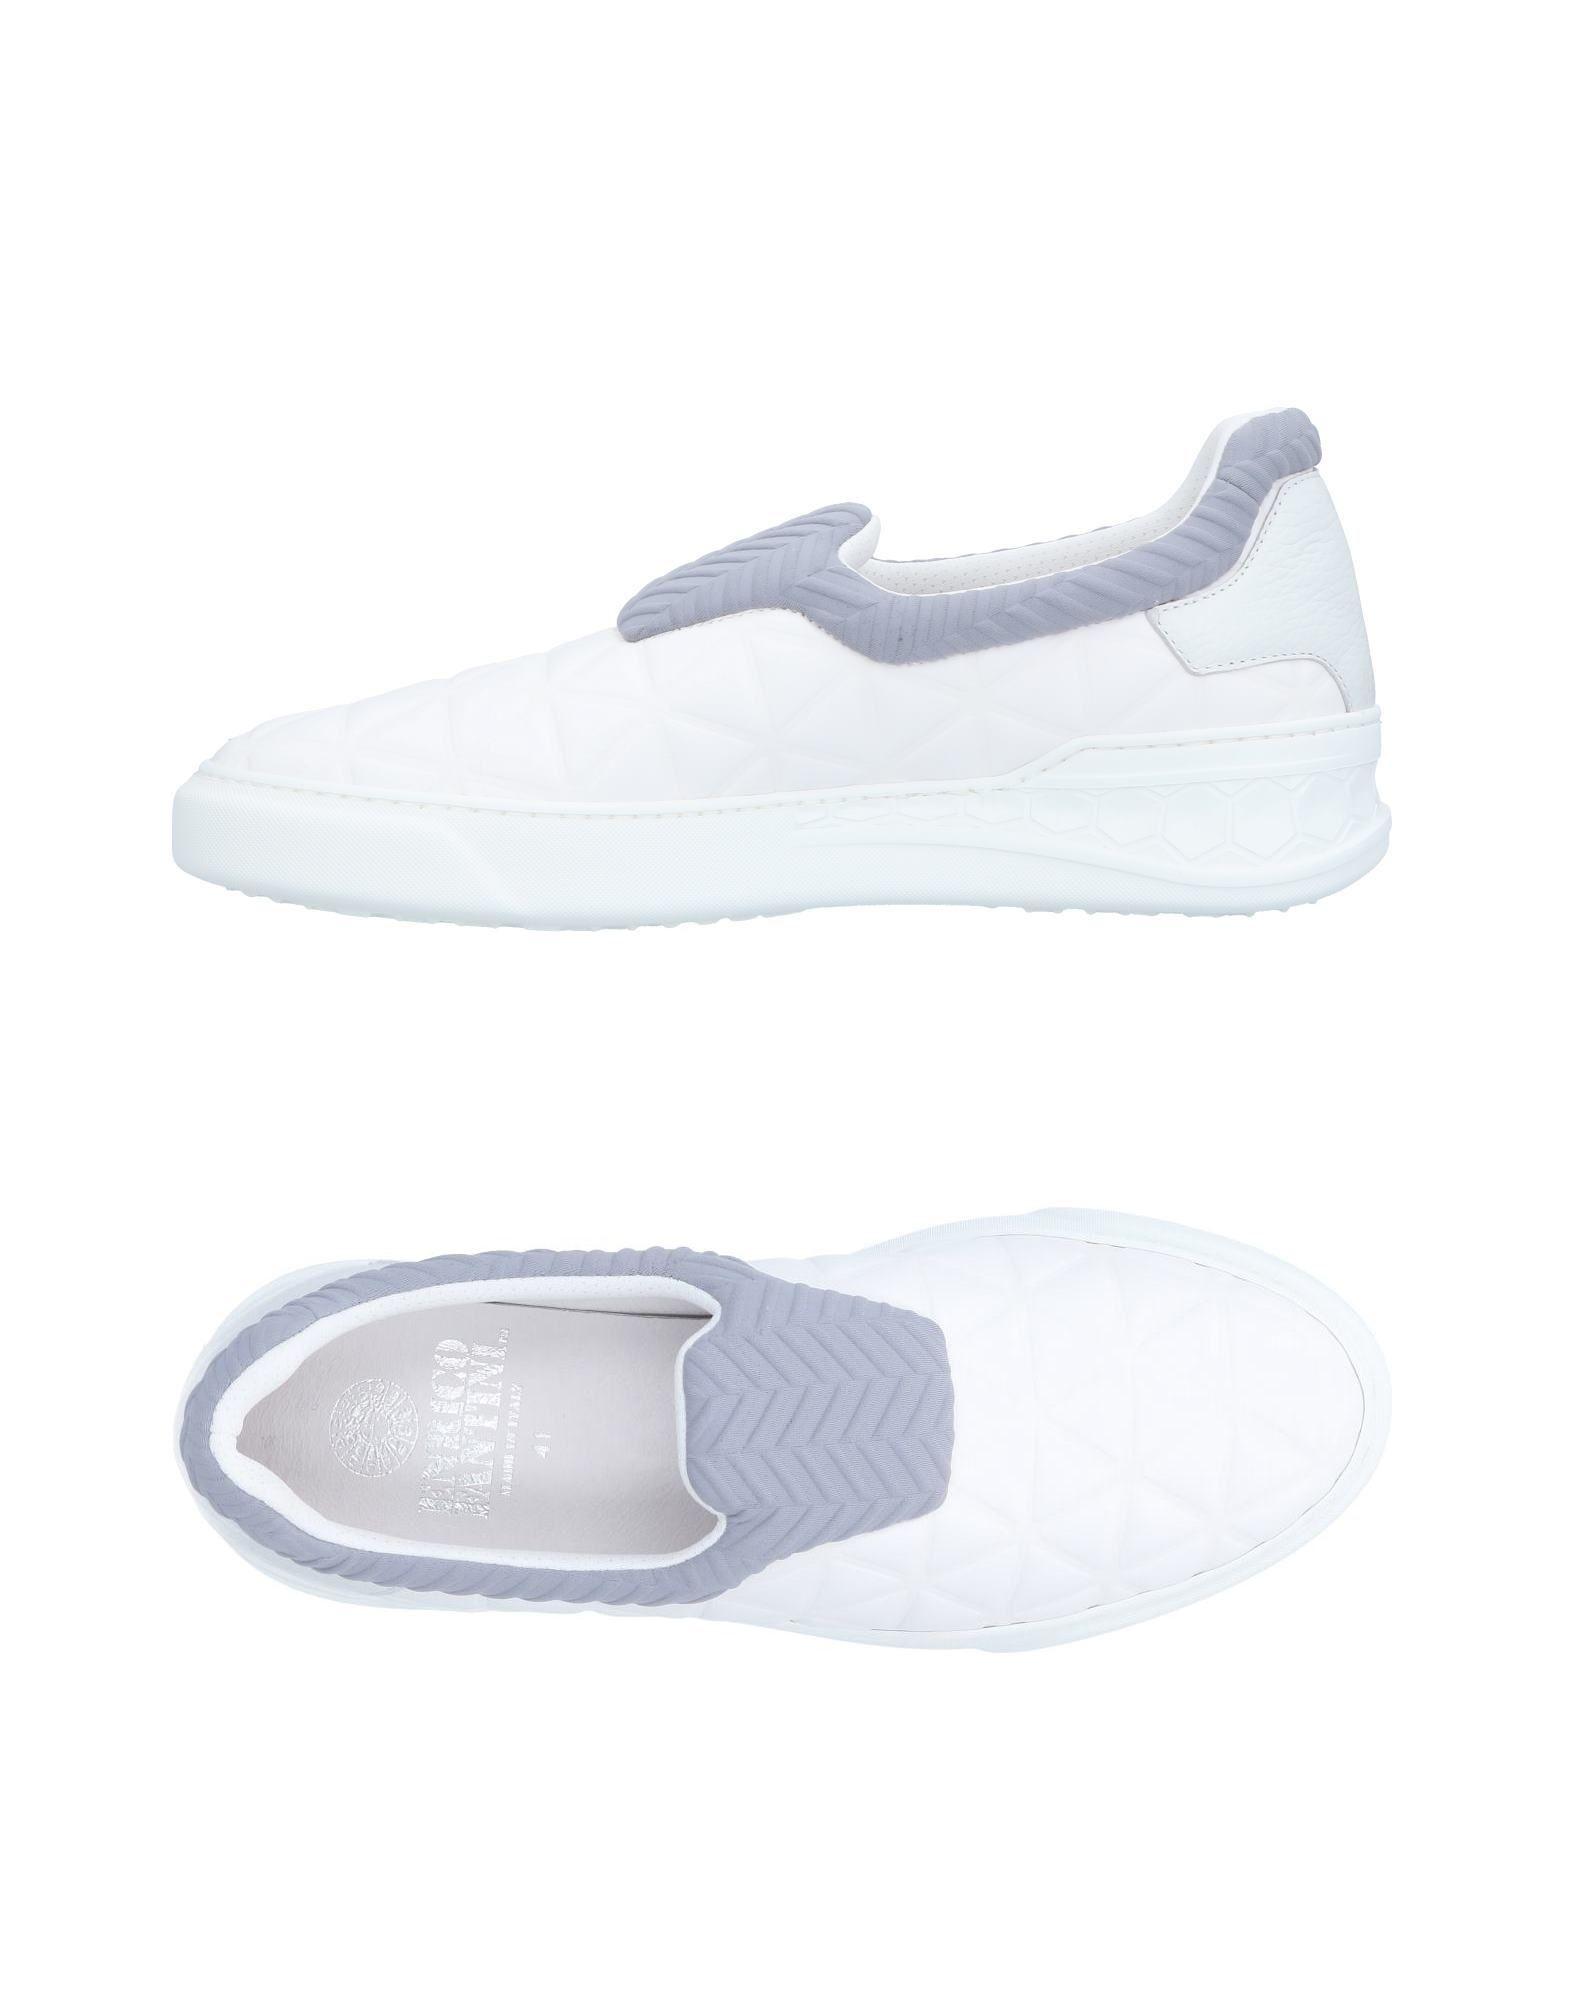 Enrico Fantini Sneakers Herren  11449353QV Neue Schuhe